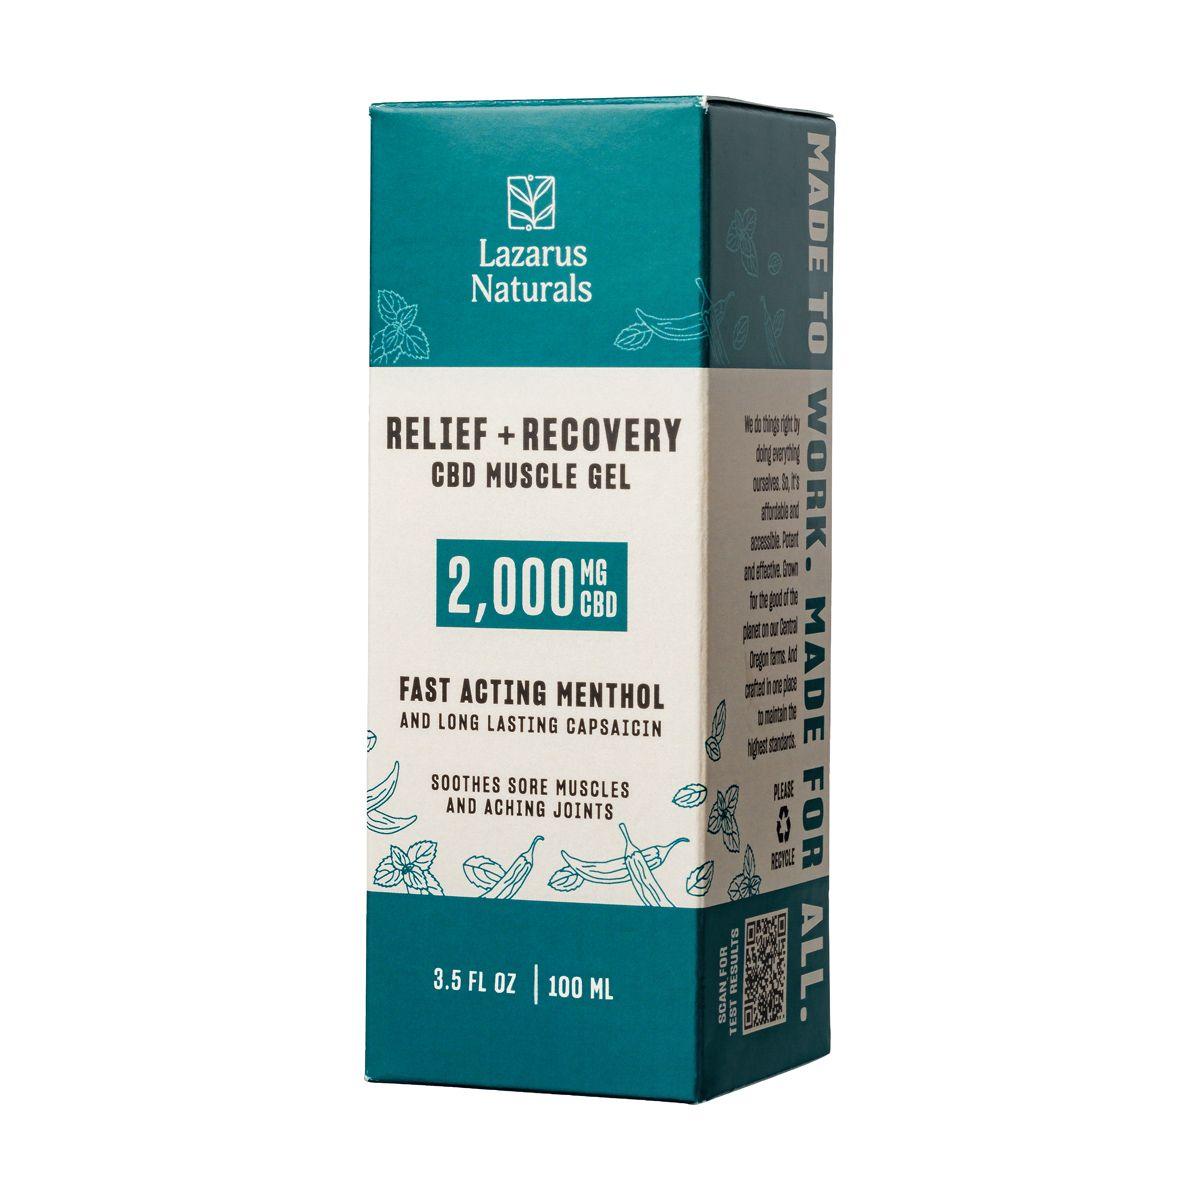 Lazarus Naturals, Relief & Recovery CBD Muscle Gel, Full Spectrum, 3.5oz, 2000mg CBD